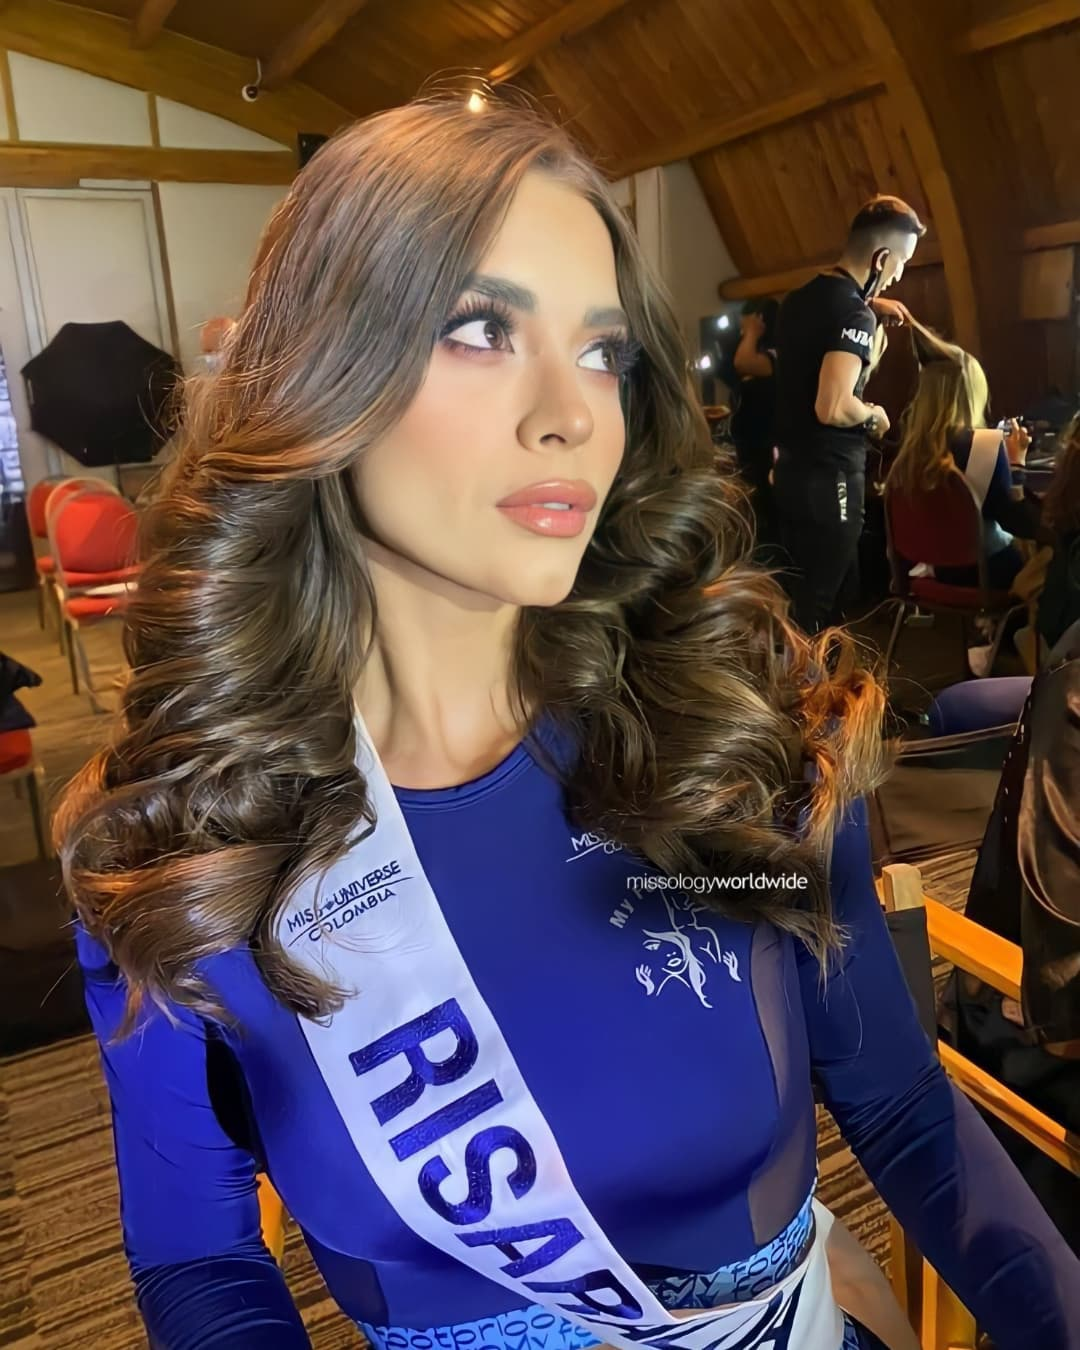 maria alejandra lopez perez, top 2 de miss universe colombia 2021/reyna hispanoamericana 2013/miss caraibes hibiscus 2014/miss colombia mundo 2015. - Página 5 24177610